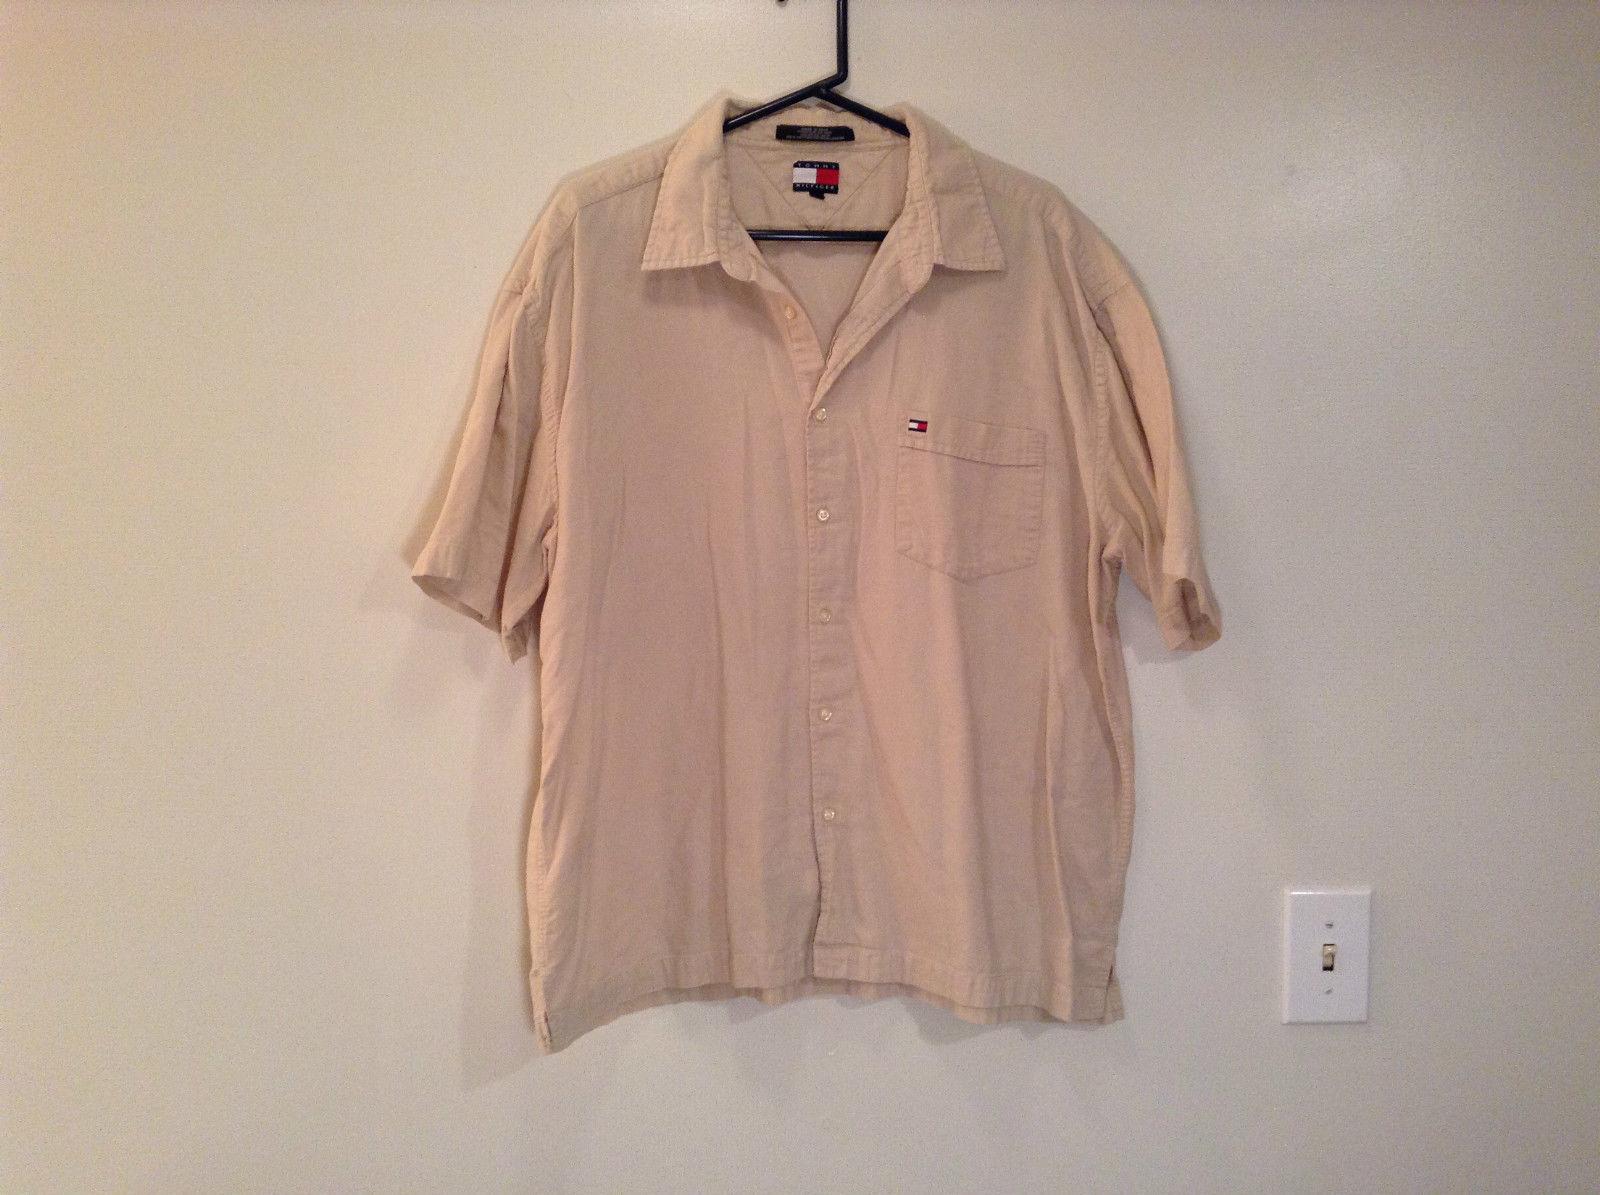 Light Tan Sand Short Sleeve Tommy Hilfiger 100 Percent Cotton Shirt Size XXL